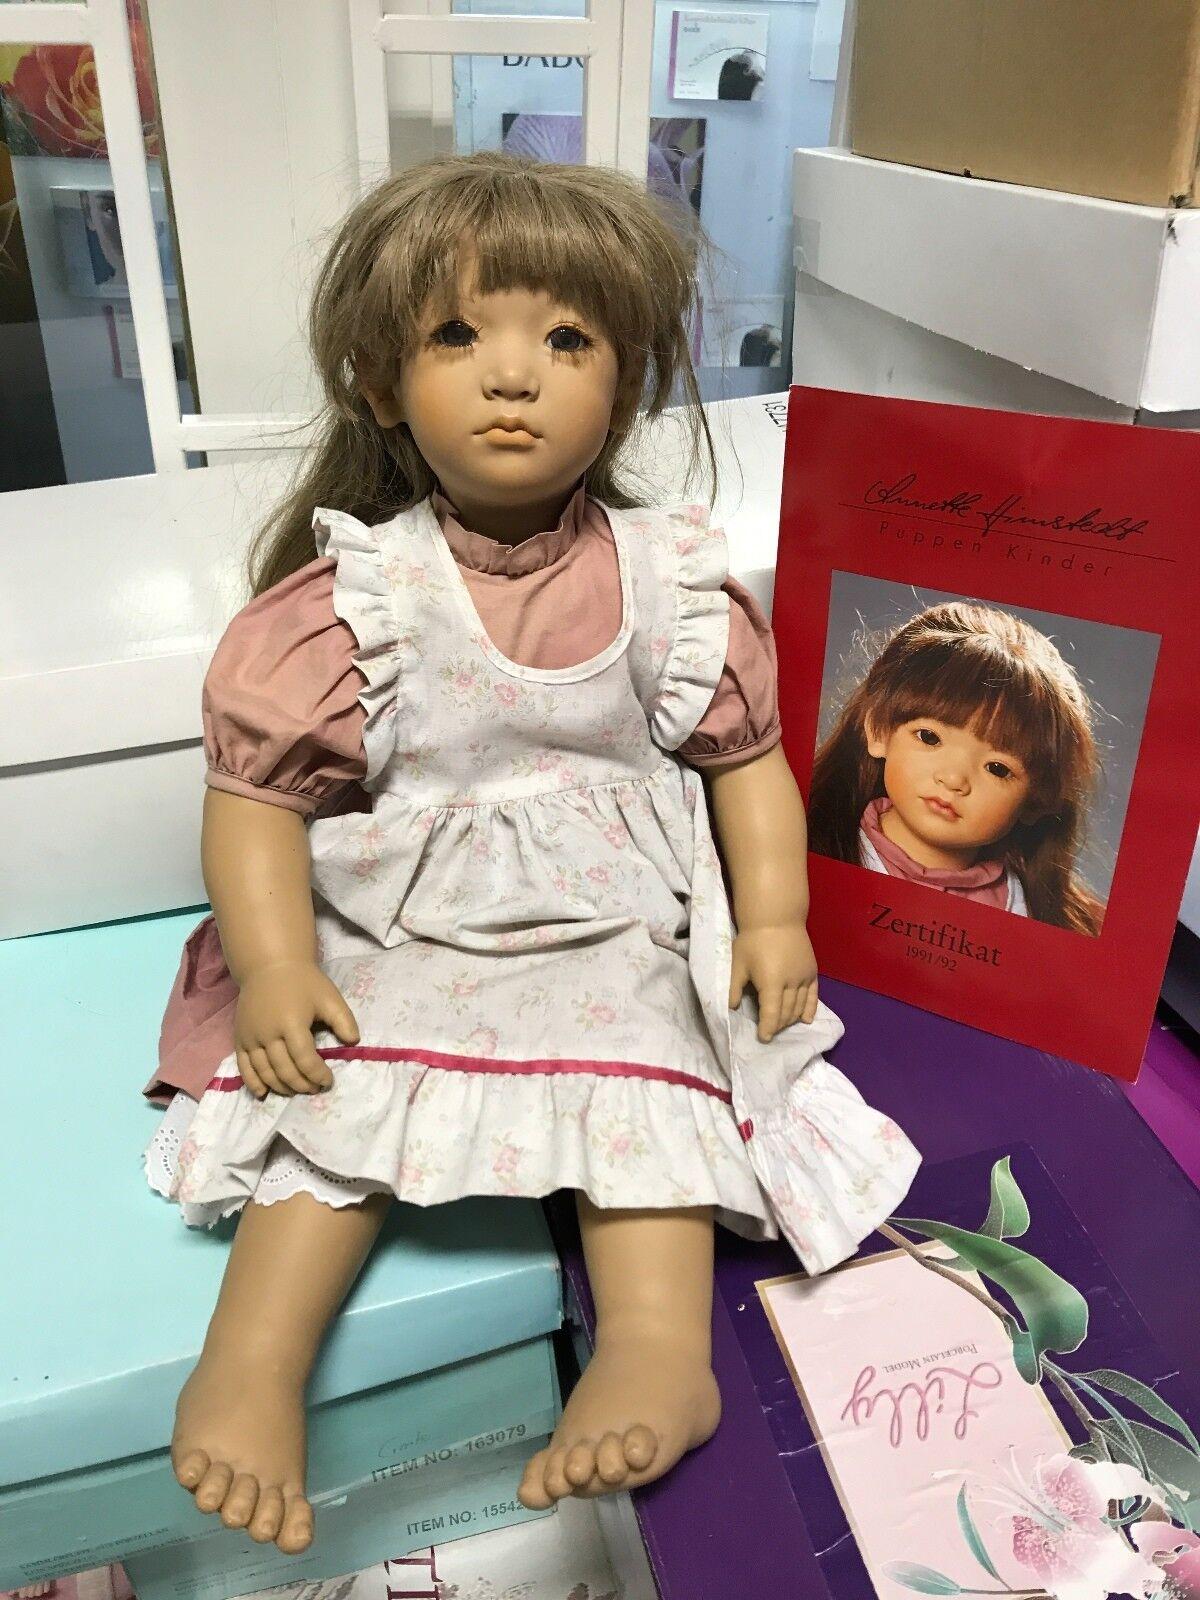 Annette Himstedt Himstedt Himstedt Puppe Neblina 65 cm Top Zustand. 914cf2